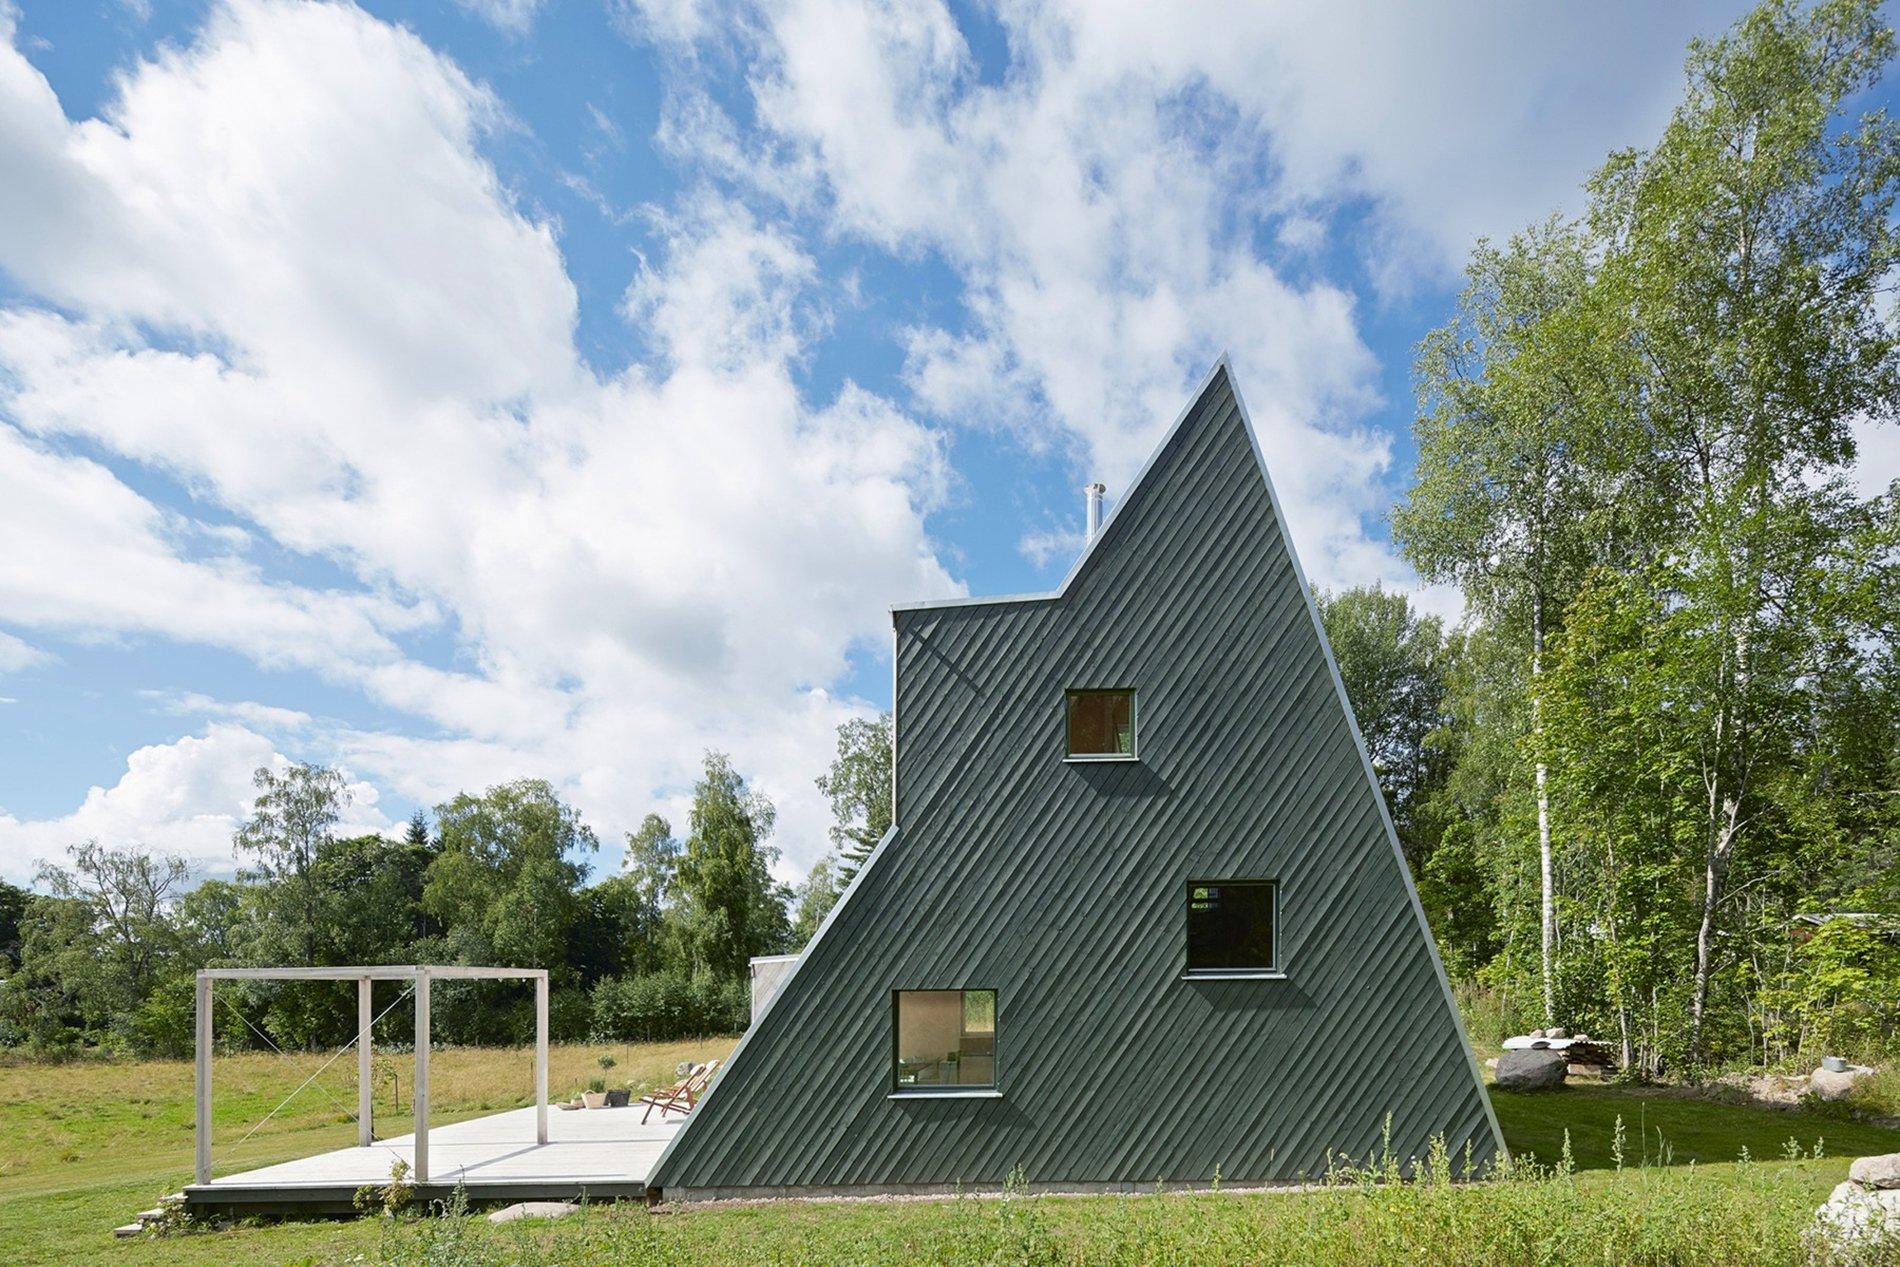 Triangular Summer Getaway Home In Sweden